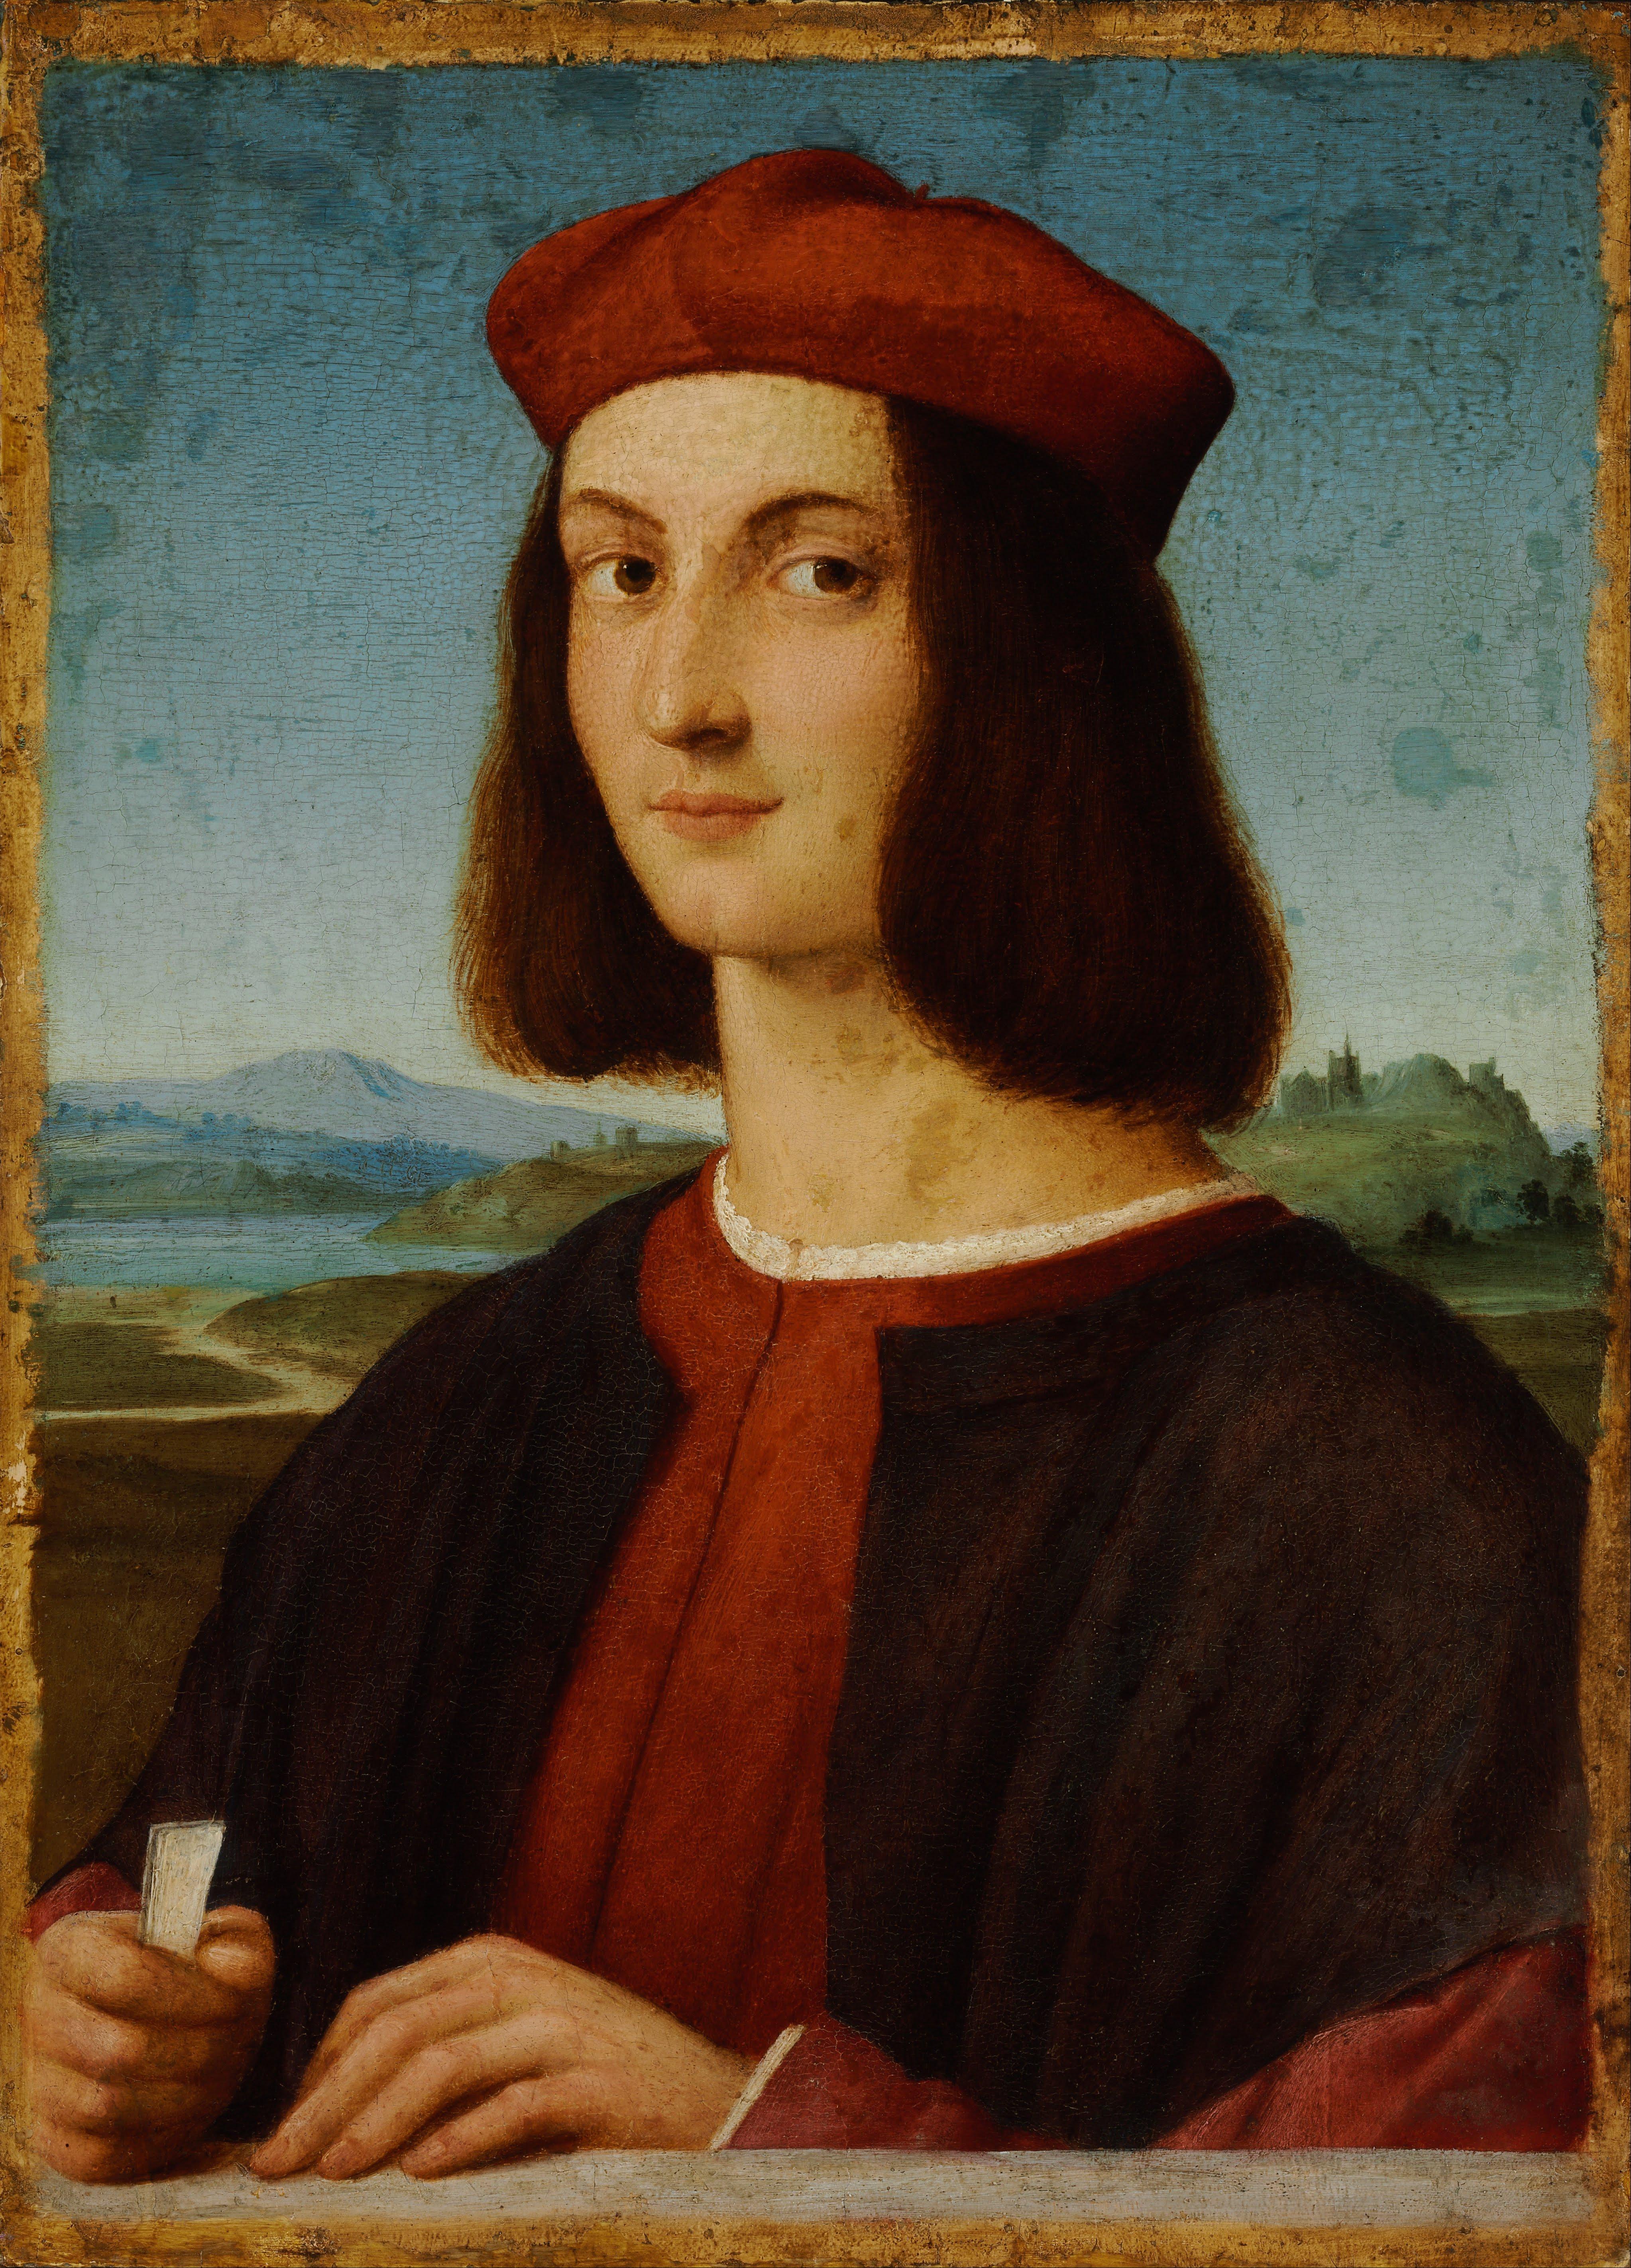 File:Raffaello Santi - Portrait of Pietro Bembo - Google